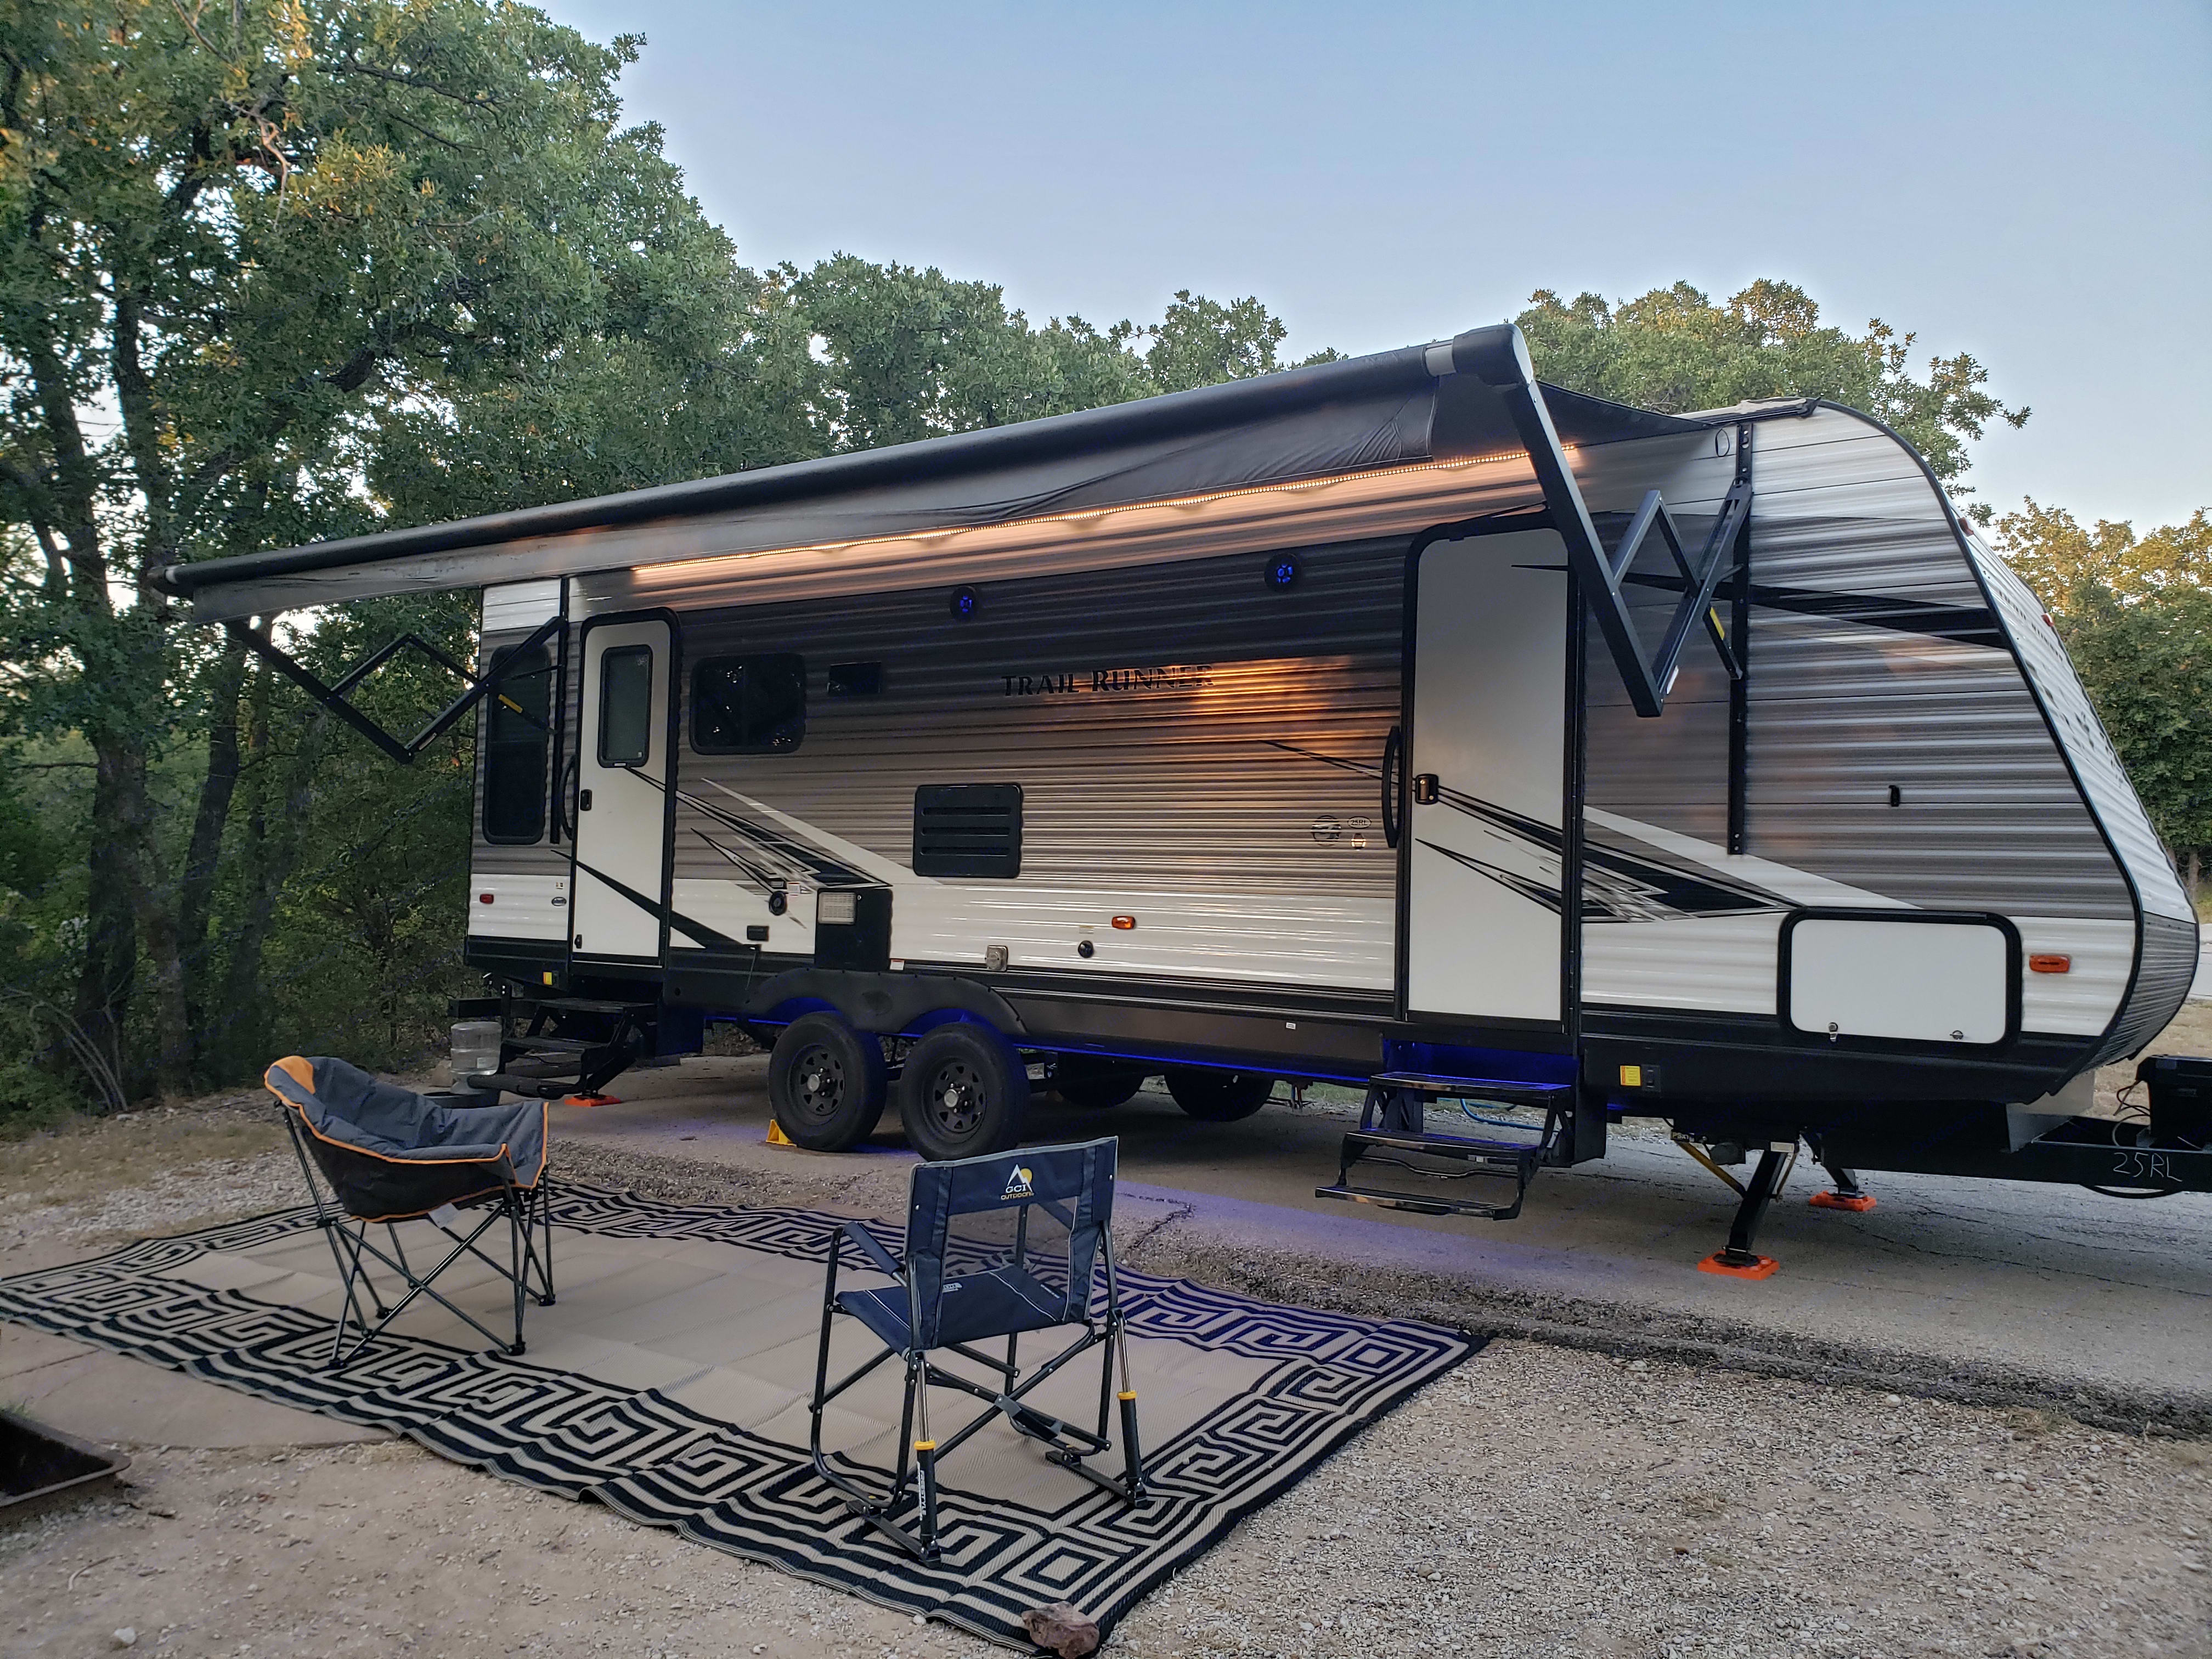 My campsite setup. Heartland Trail Runner 2020